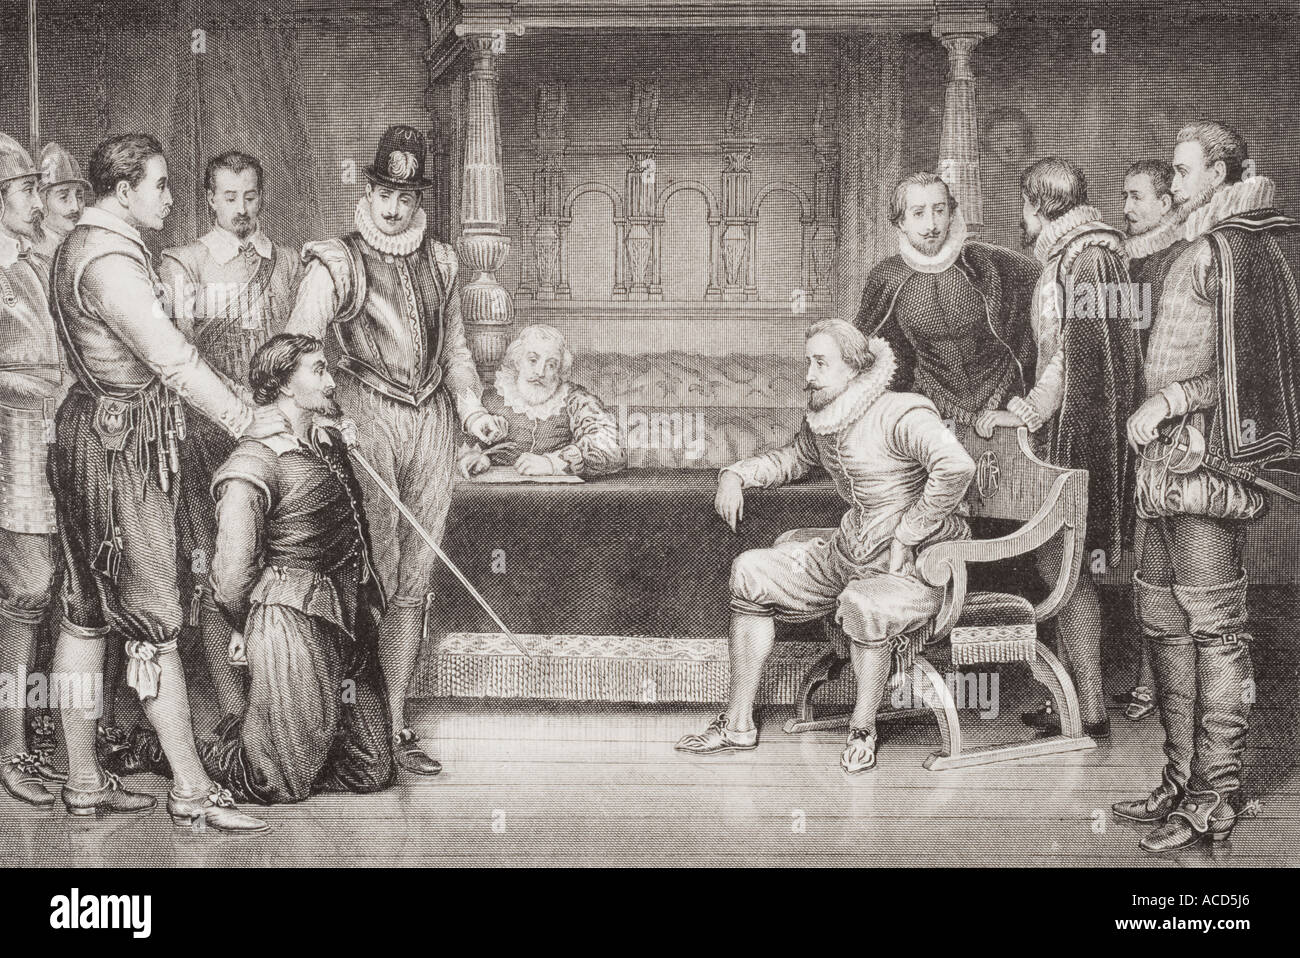 La Pólvora Parcela Guy Fawkes interrogados por Jaime I Imagen De Stock